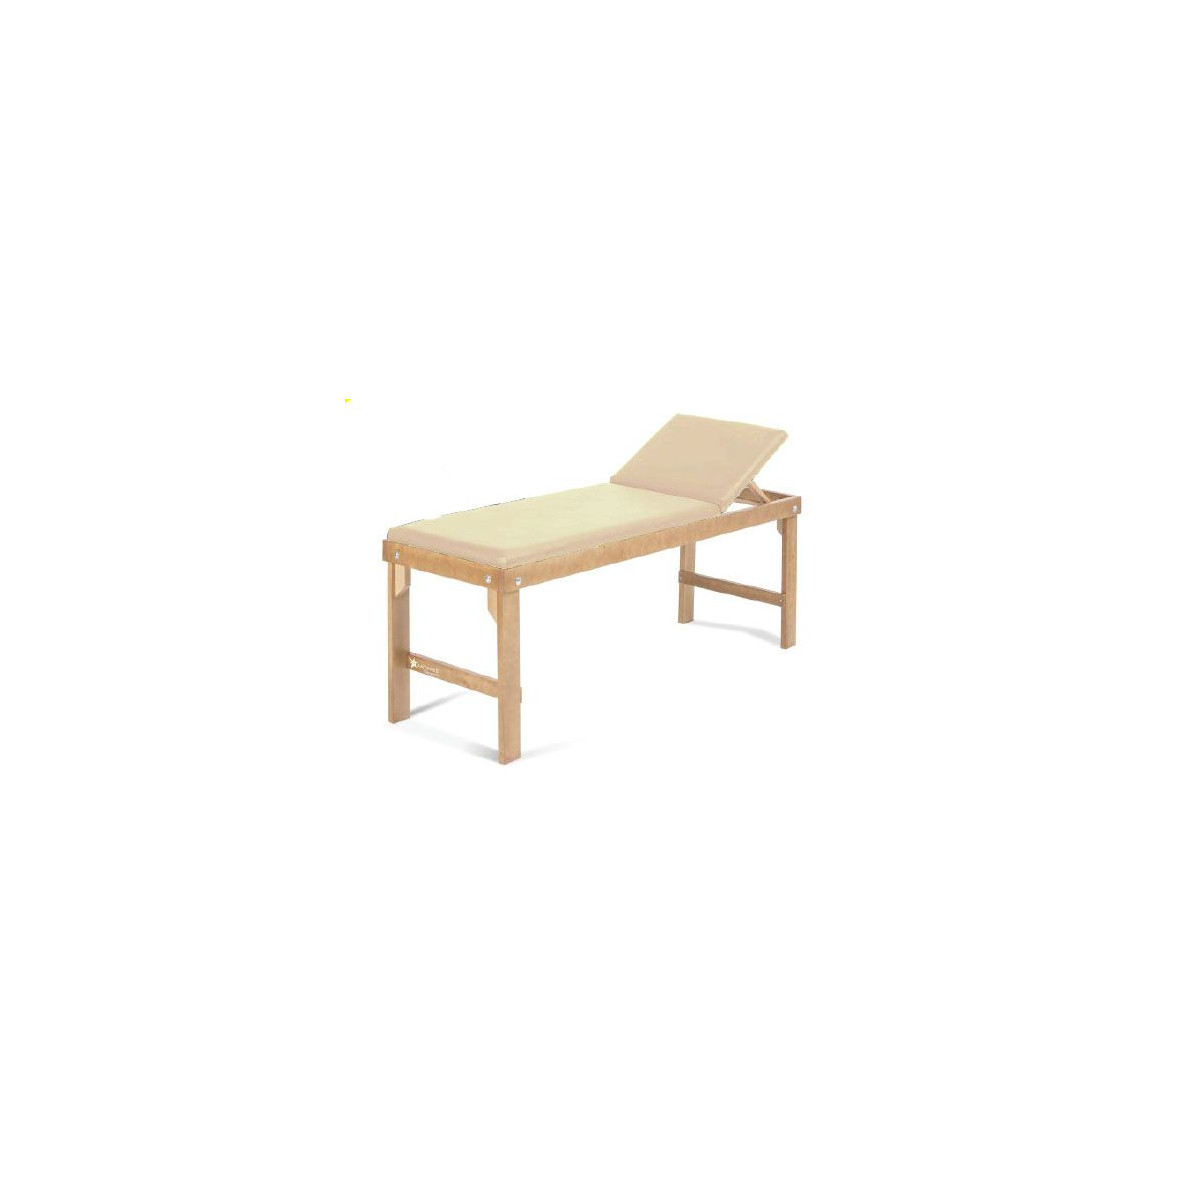 Wooden Examination Bed